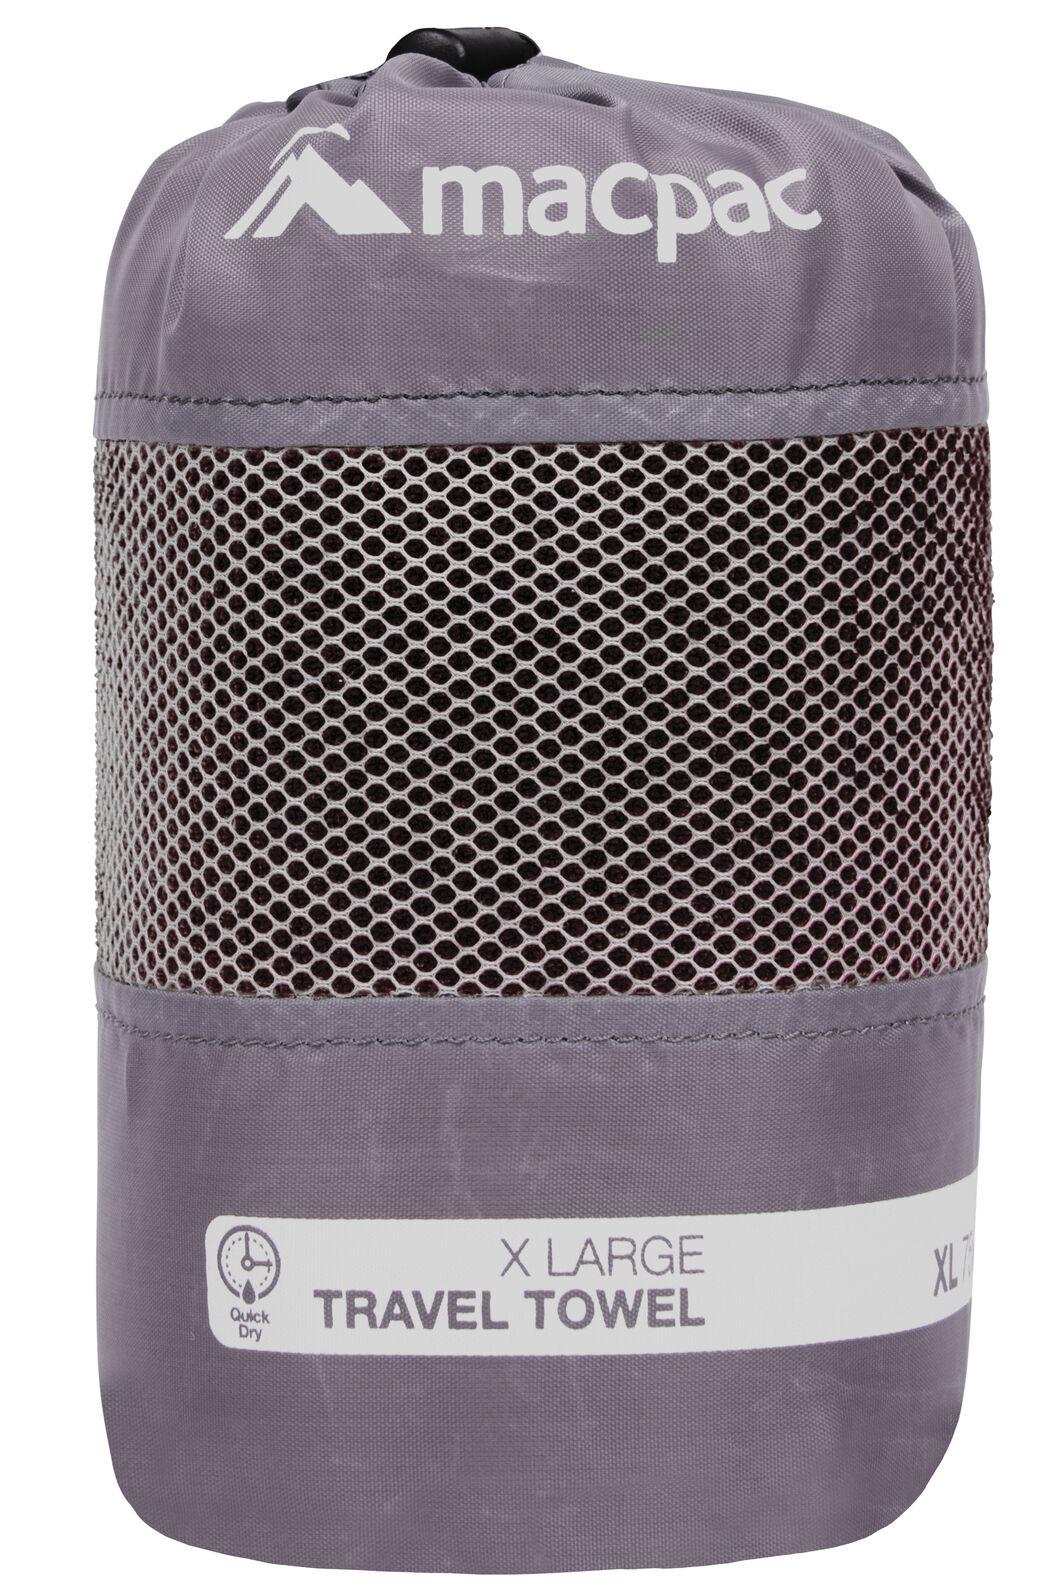 Macpac Travel Towel XL, Black, hi-res